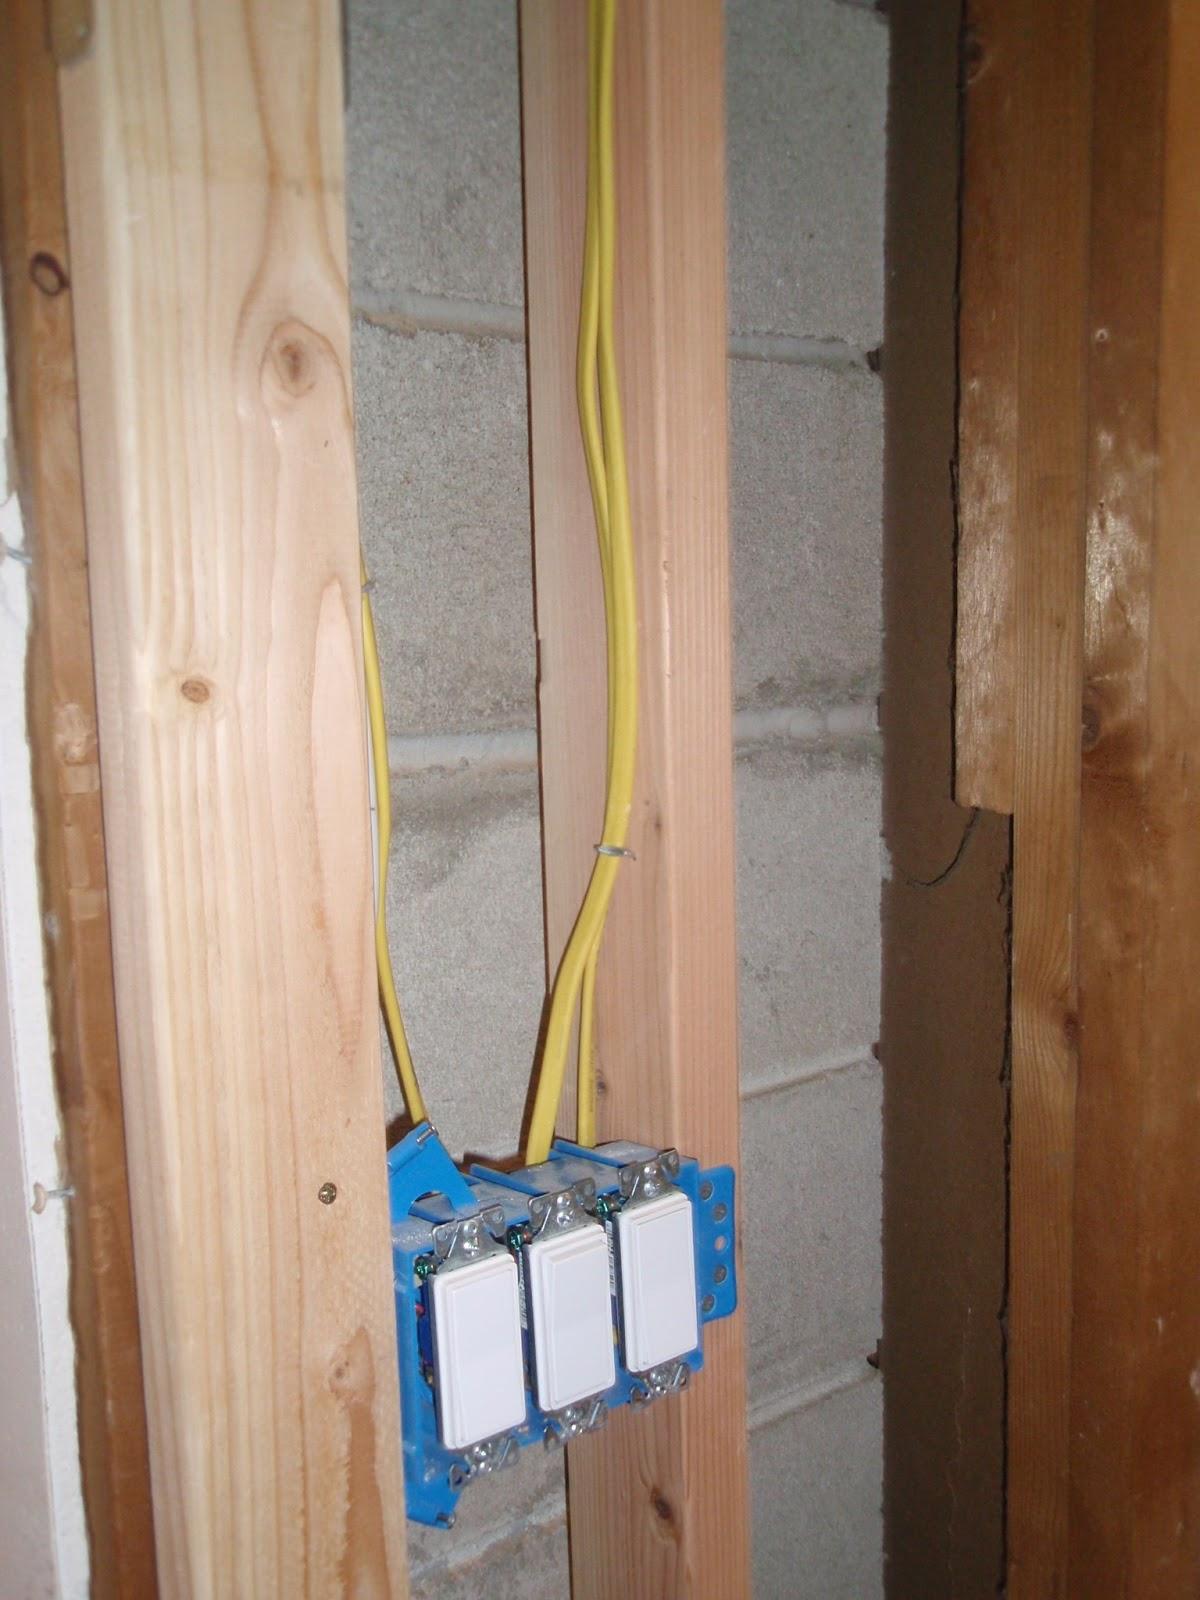 North Castle Way Hallway Lights Switches